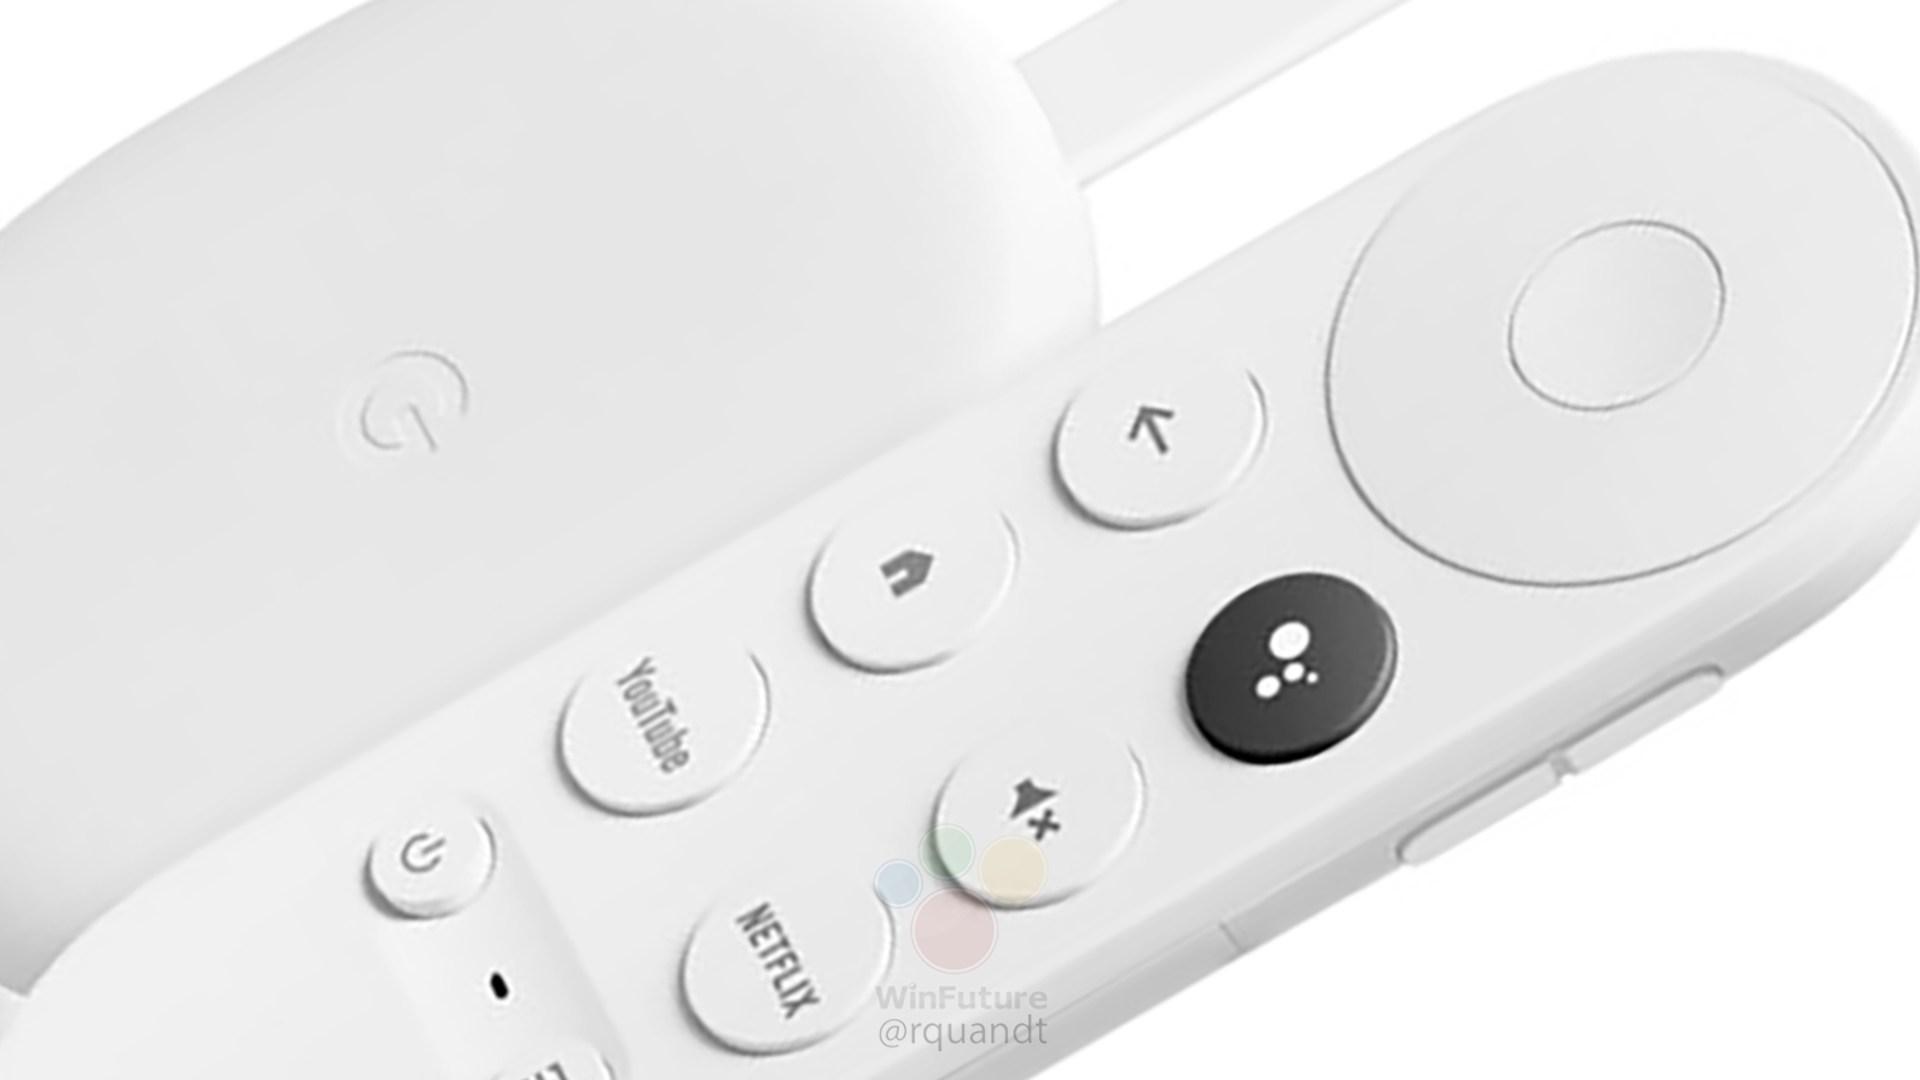 Google, Streaming, Tv, chromecast, Google Tv, Android TV, Dongle, Google ChromeCast, TV-Stick